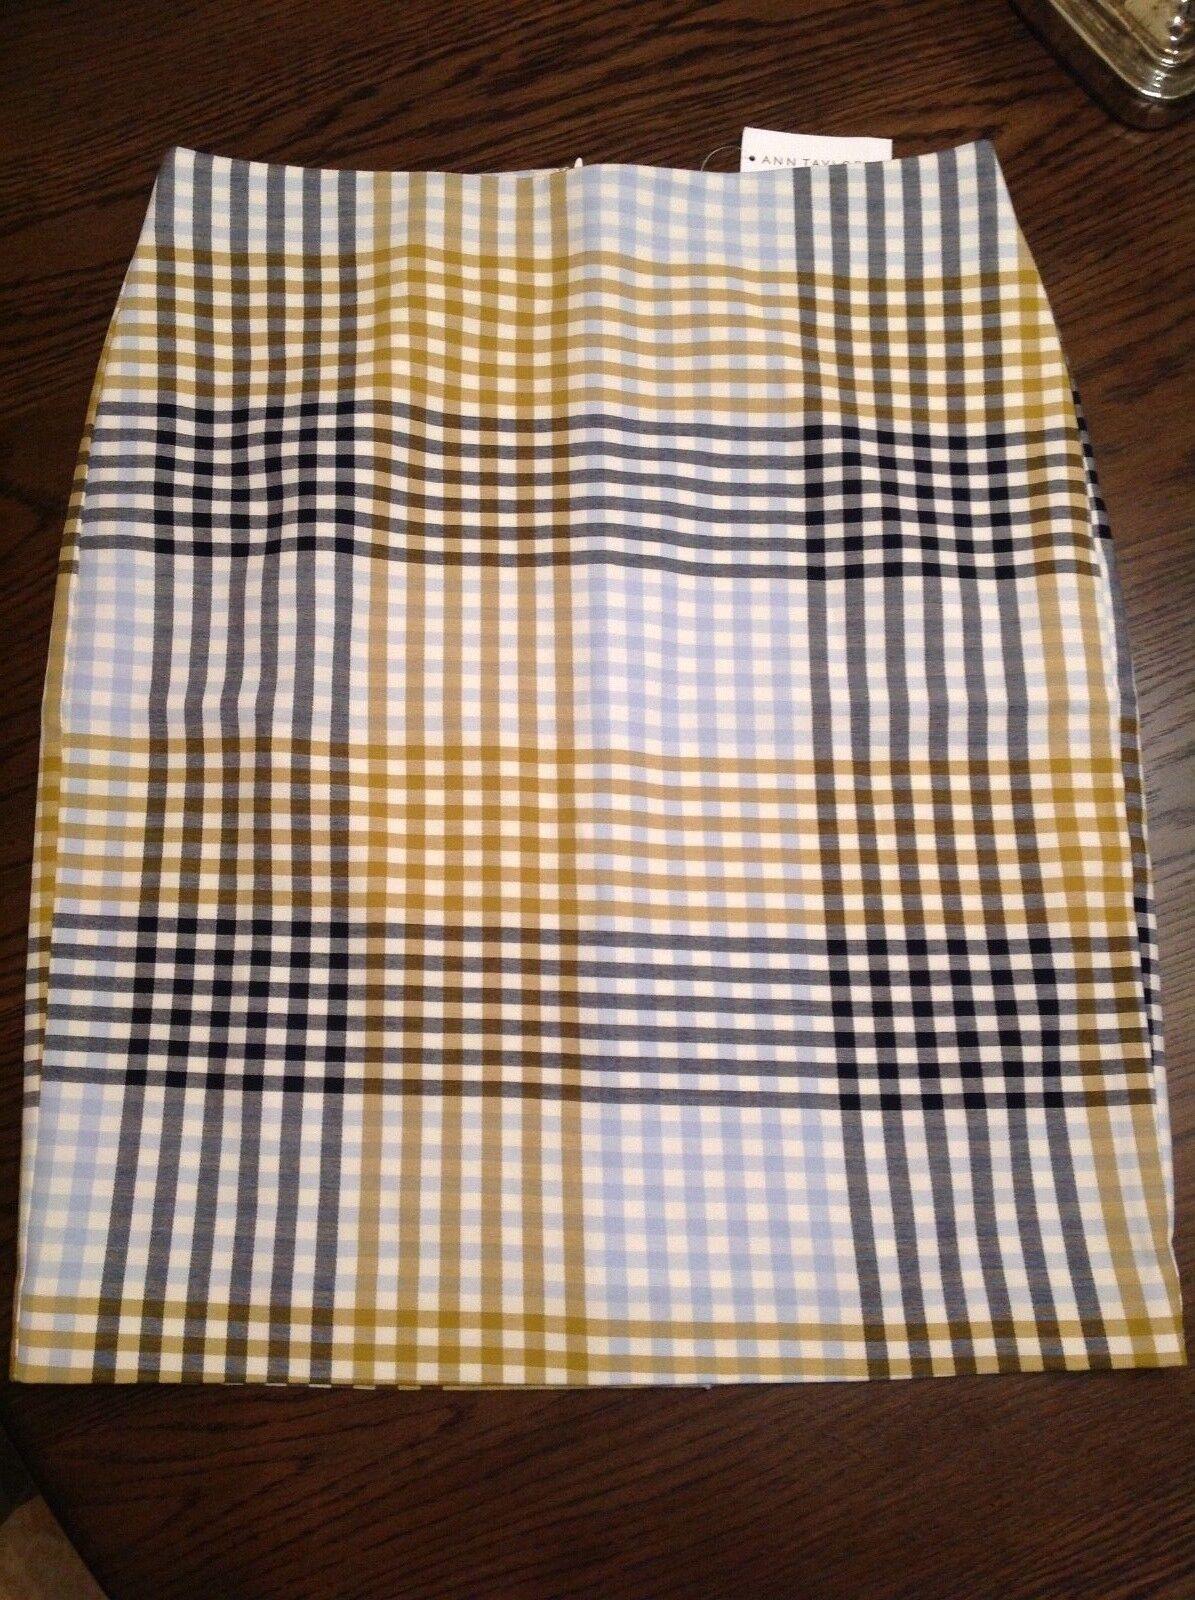 Ann Taylor Factory Store Gingham Stripe Pencil Skirt , NWT, sz.8 orig 79.99